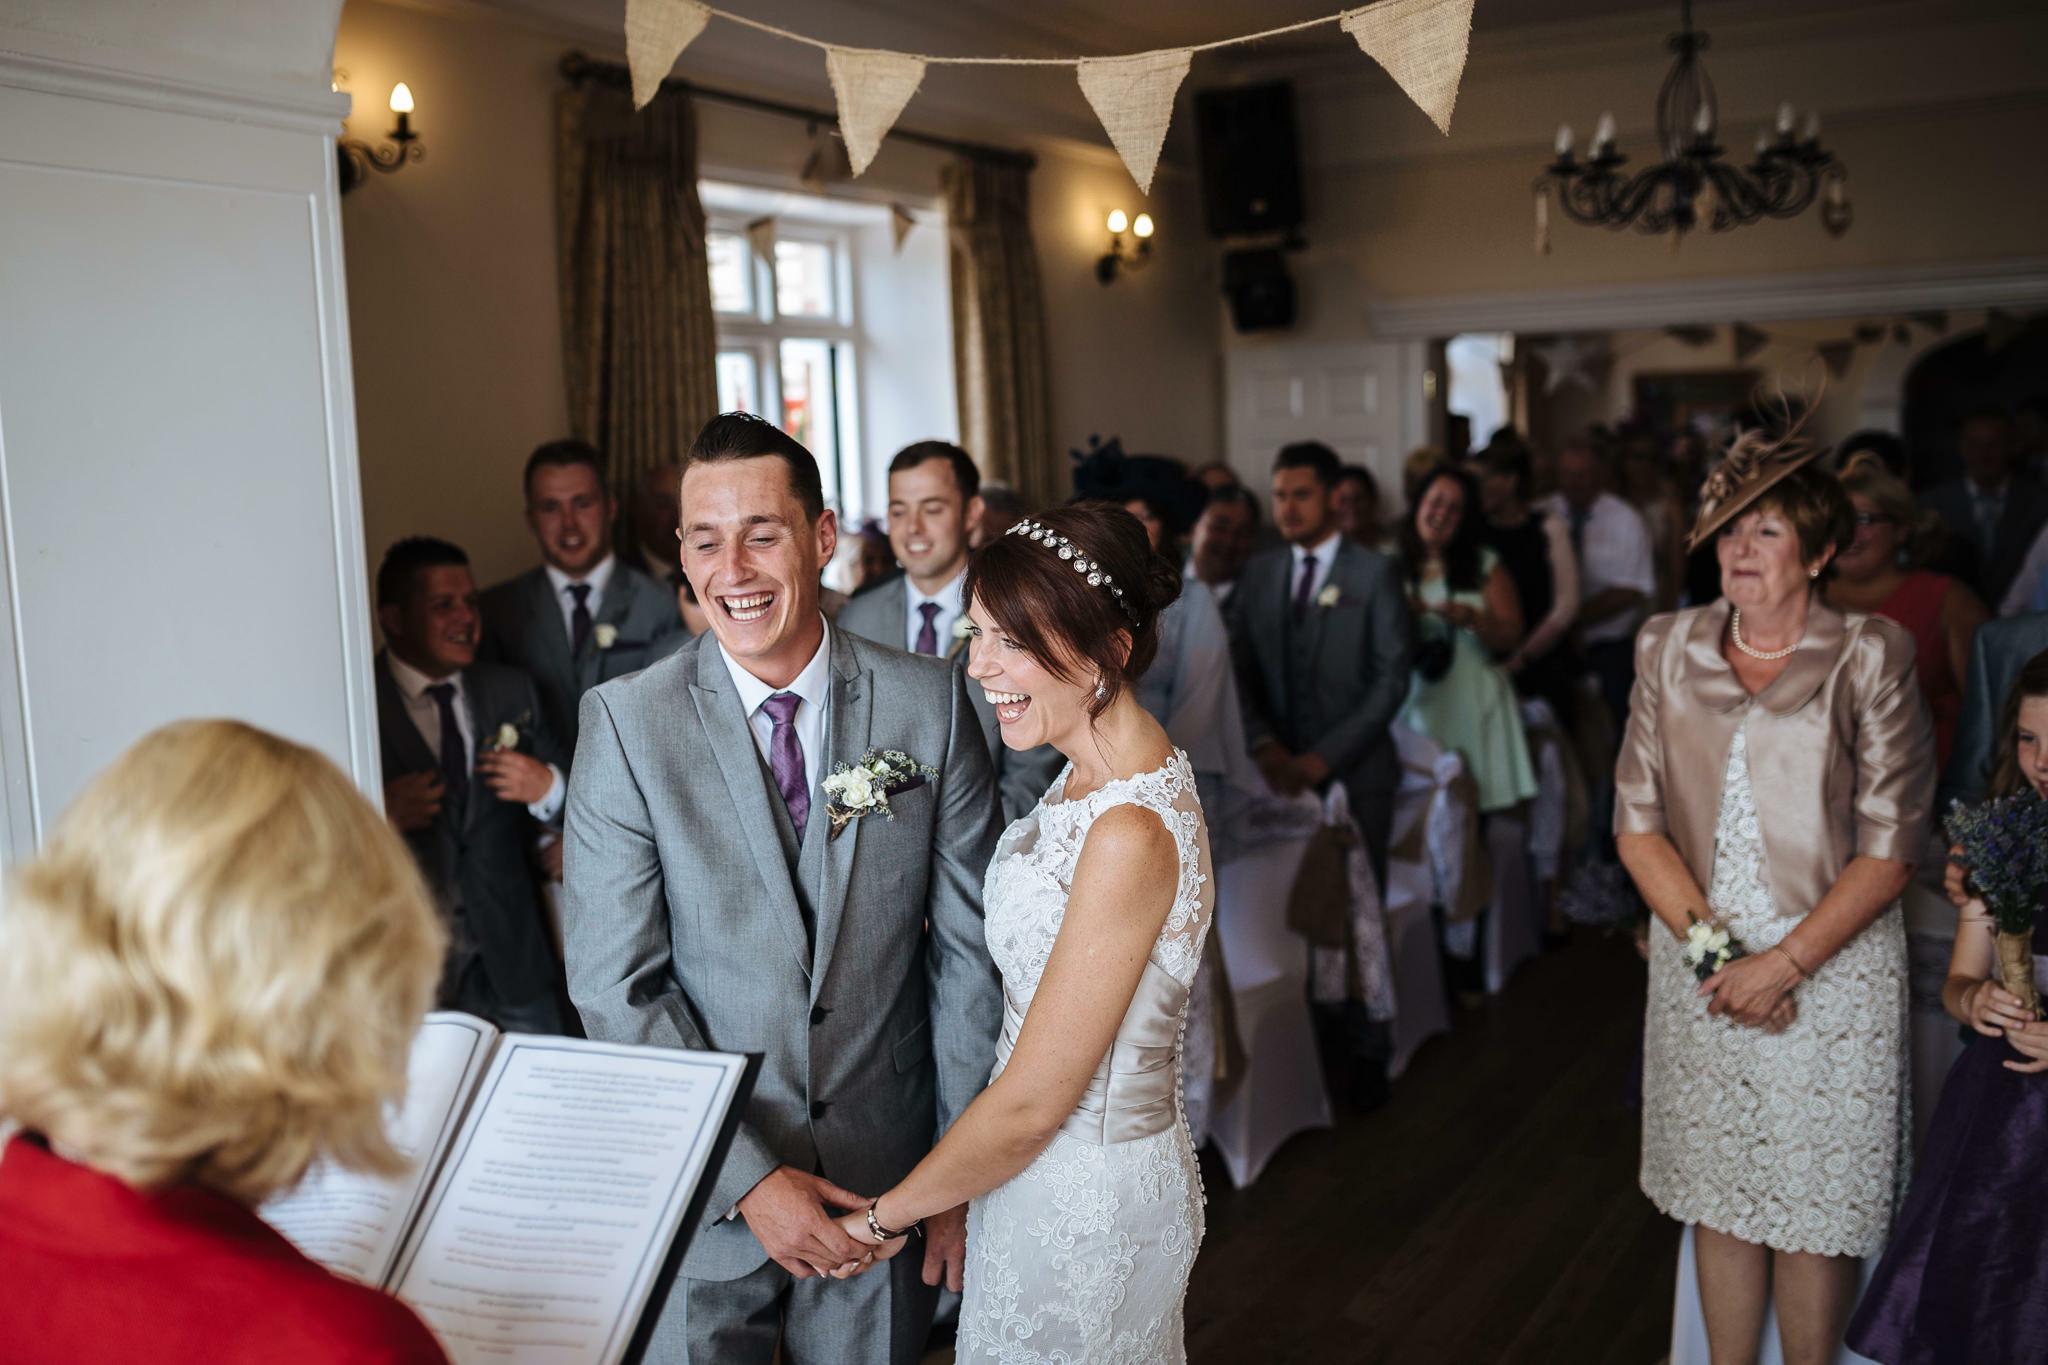 paul-marbrook-Caer-Llan-Wedding-Photographer-90042